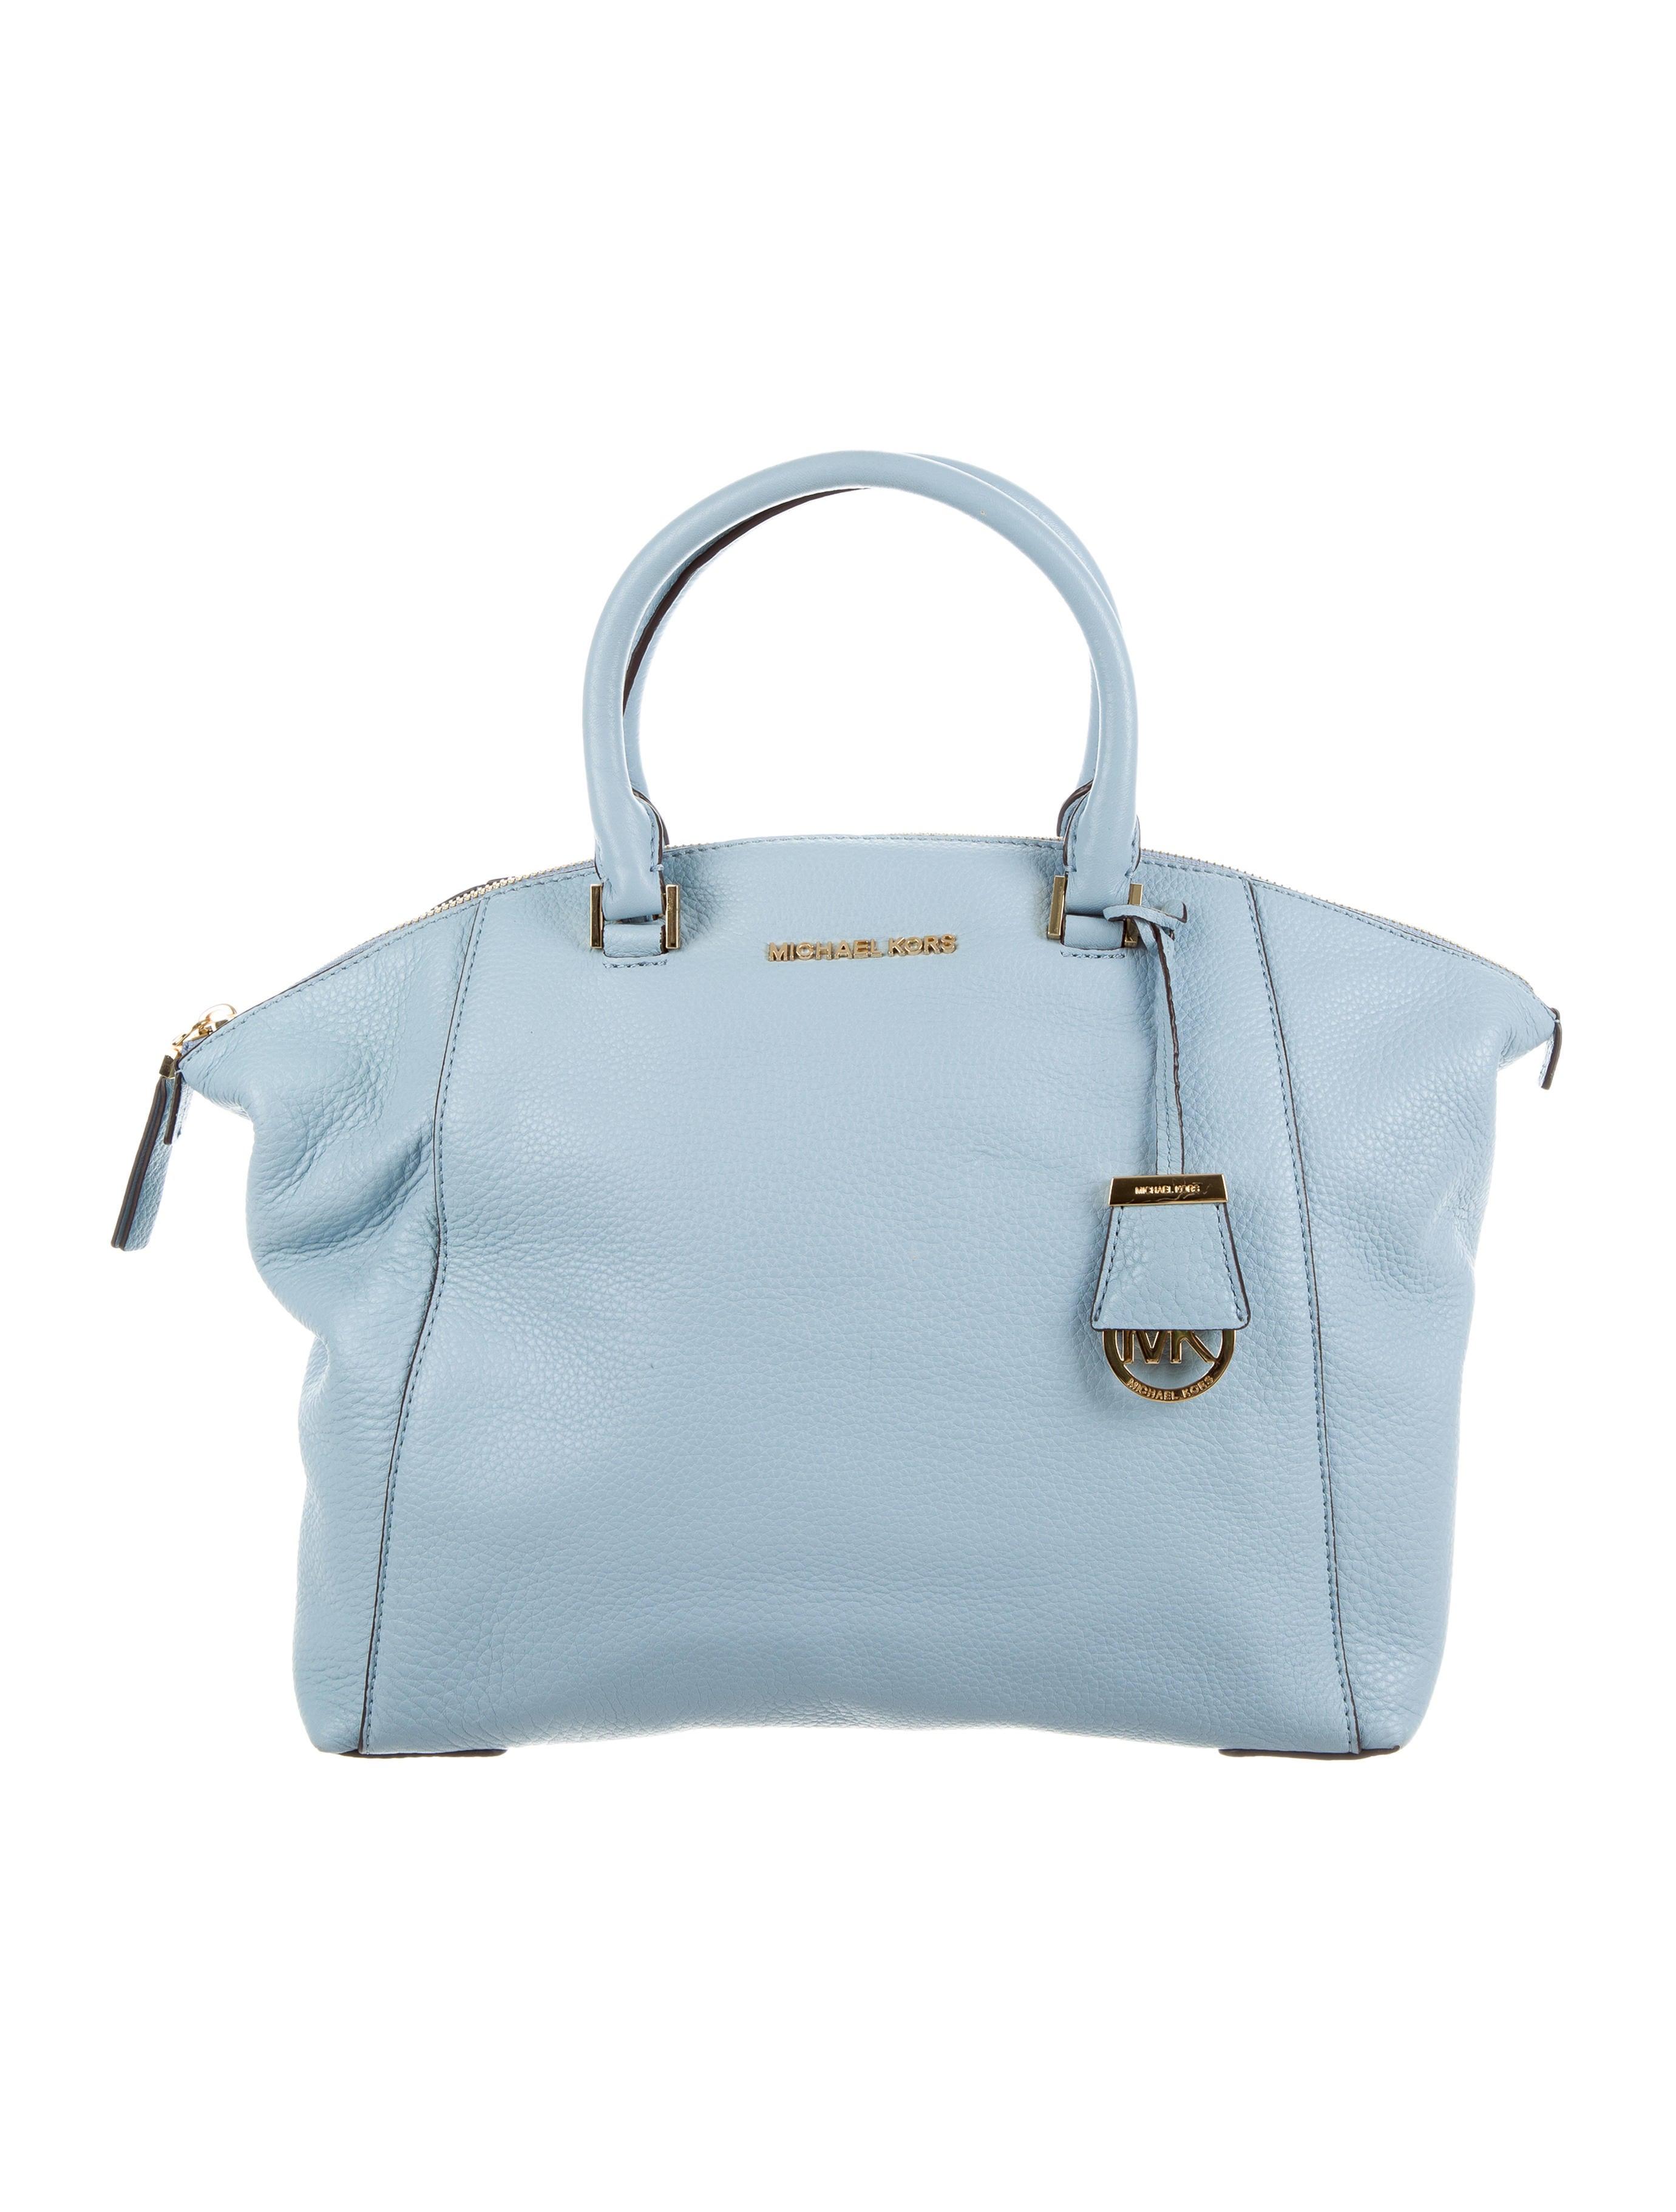 michael kors medium bedford satchel handbags mic54887. Black Bedroom Furniture Sets. Home Design Ideas